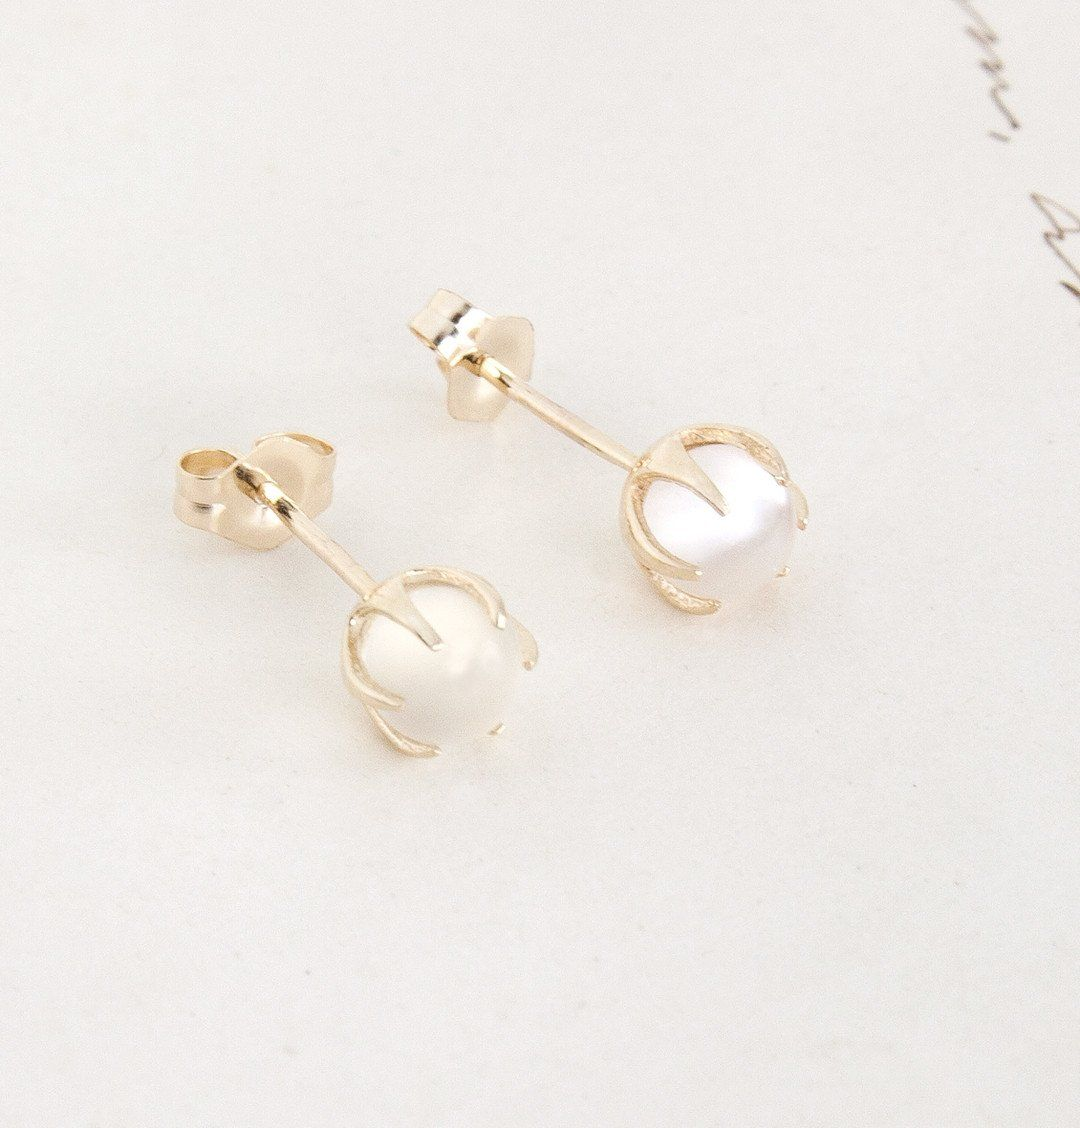 Moonstone Crystal Ball Earrings